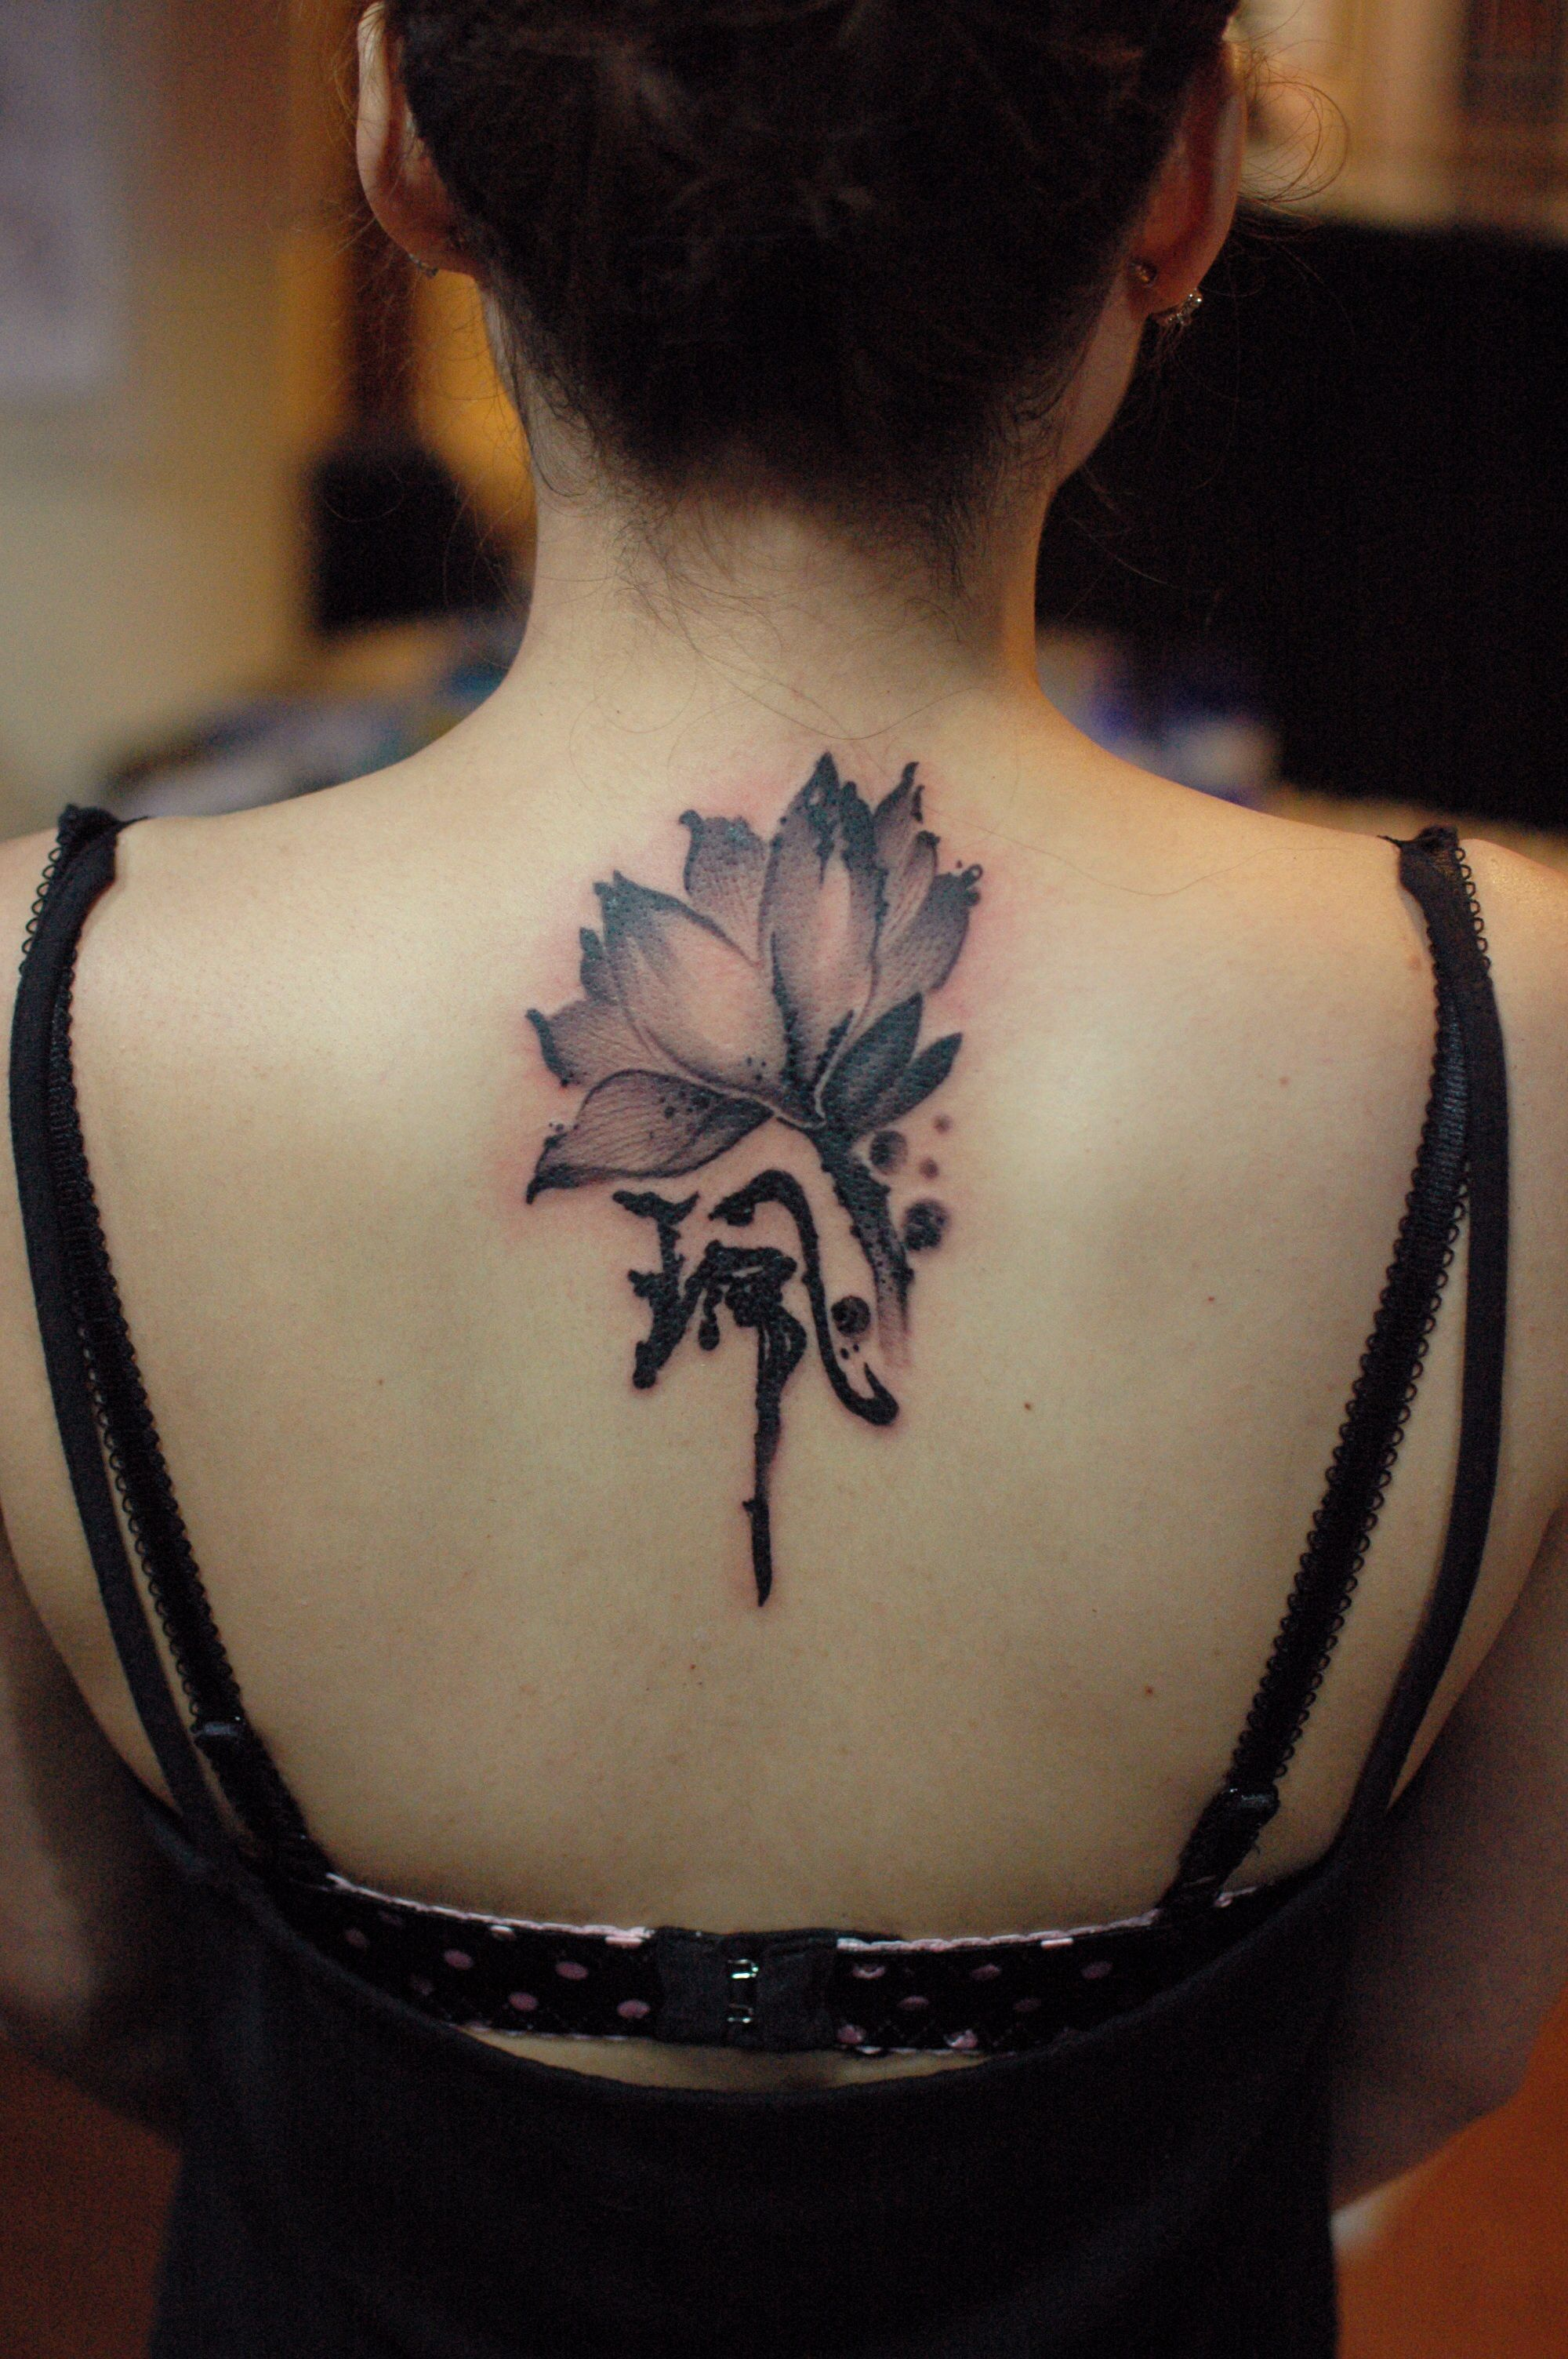 Chinese ink brush lotus tattoo by hong kong tattoo artist f cheung chinese ink brush lotus tattoo by hong kong tattoo artist f cheung izmirmasajfo